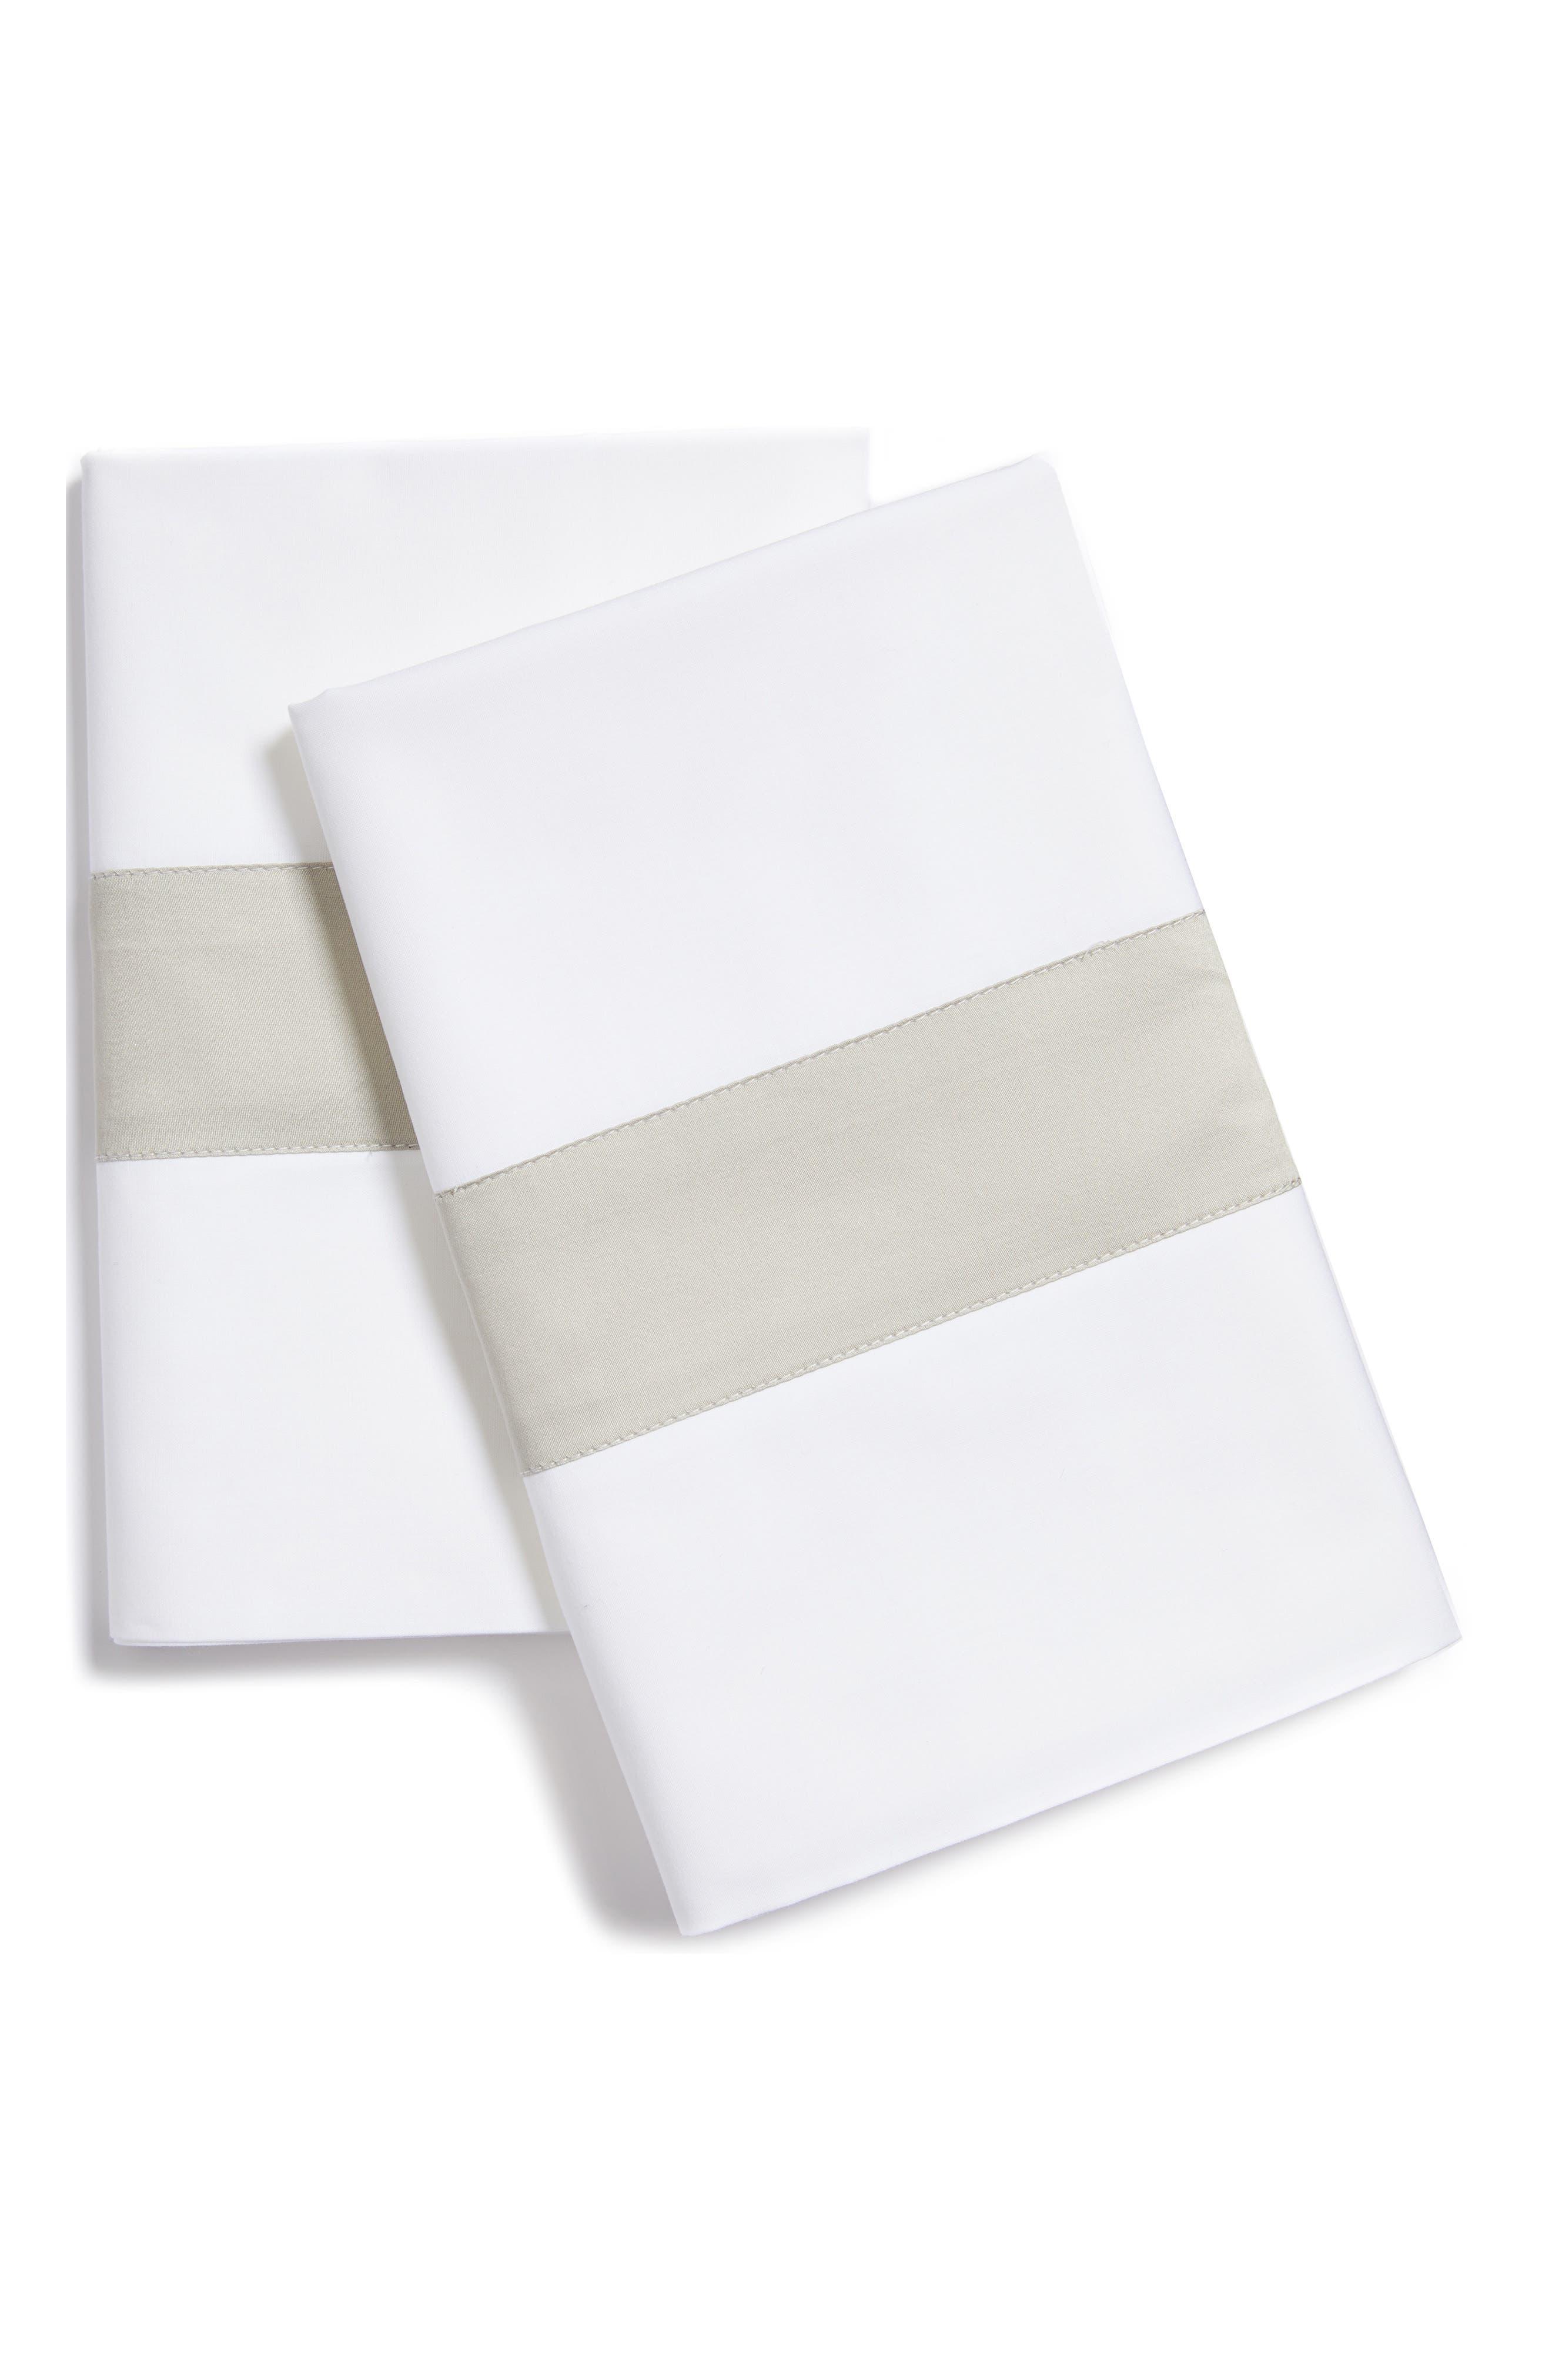 Main Image - SFERRA Orlo Pillowcase